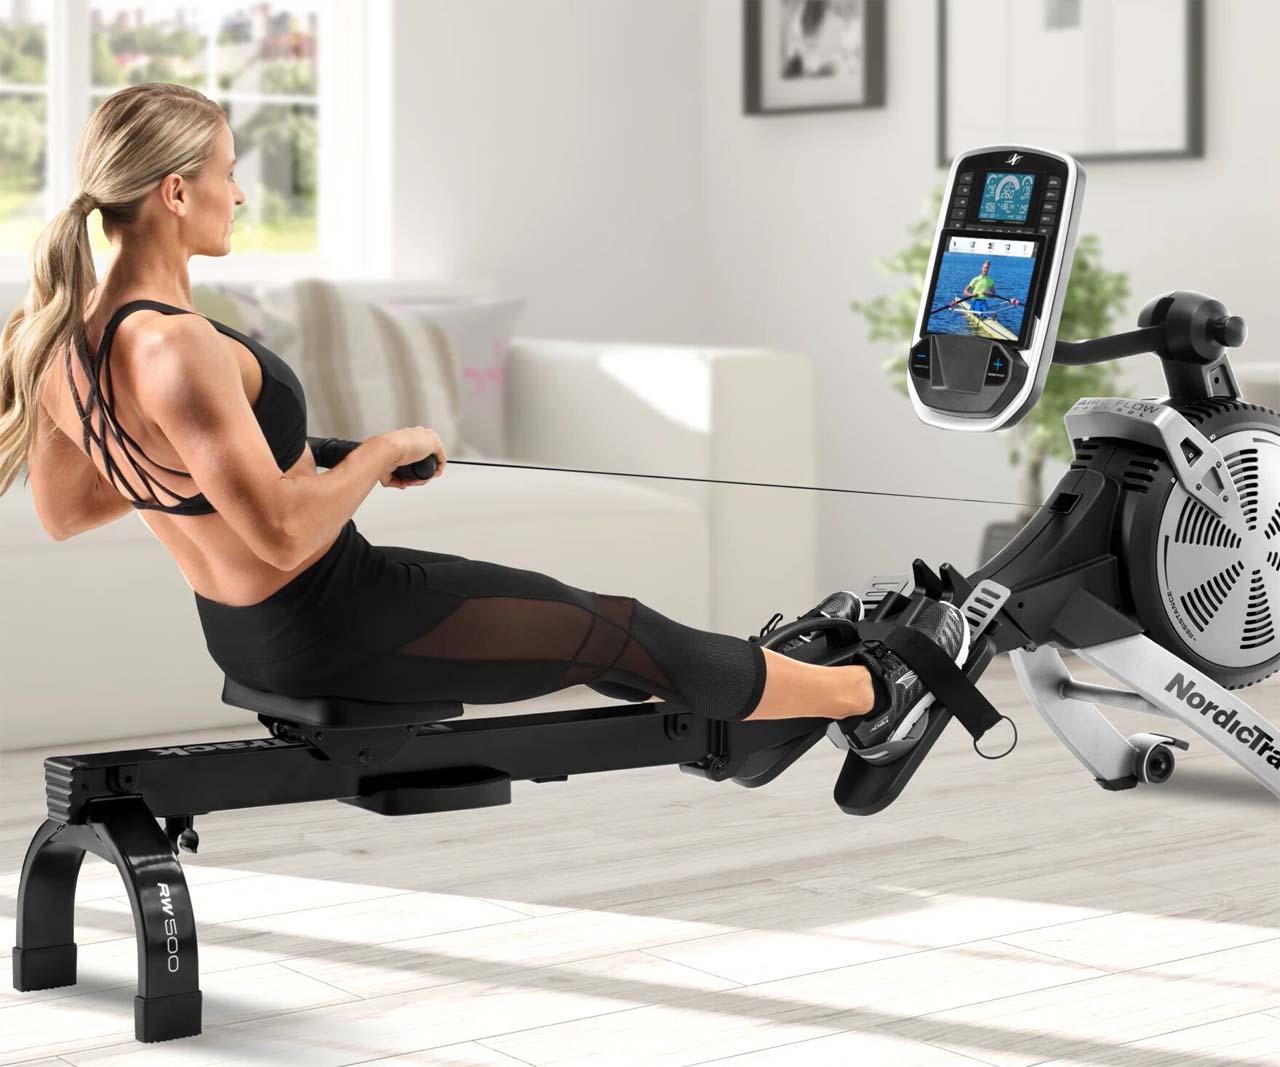 Cardio-Based Fitness Gym